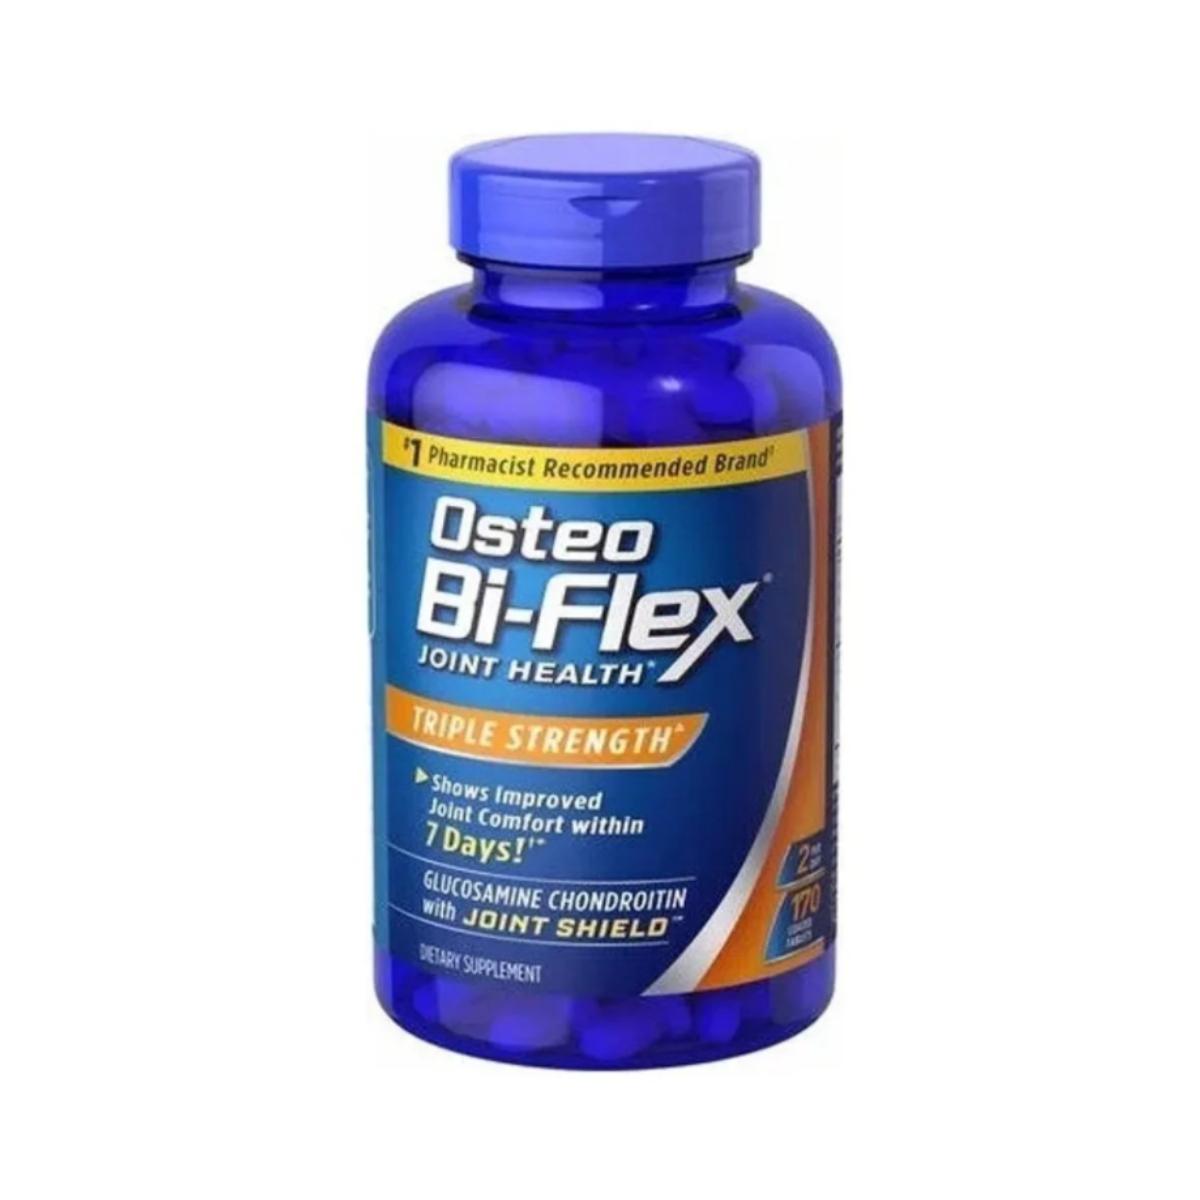 Glucosamina & Chondroitin Triple Strenght 170 Tabs - Osteo Bi-Flex